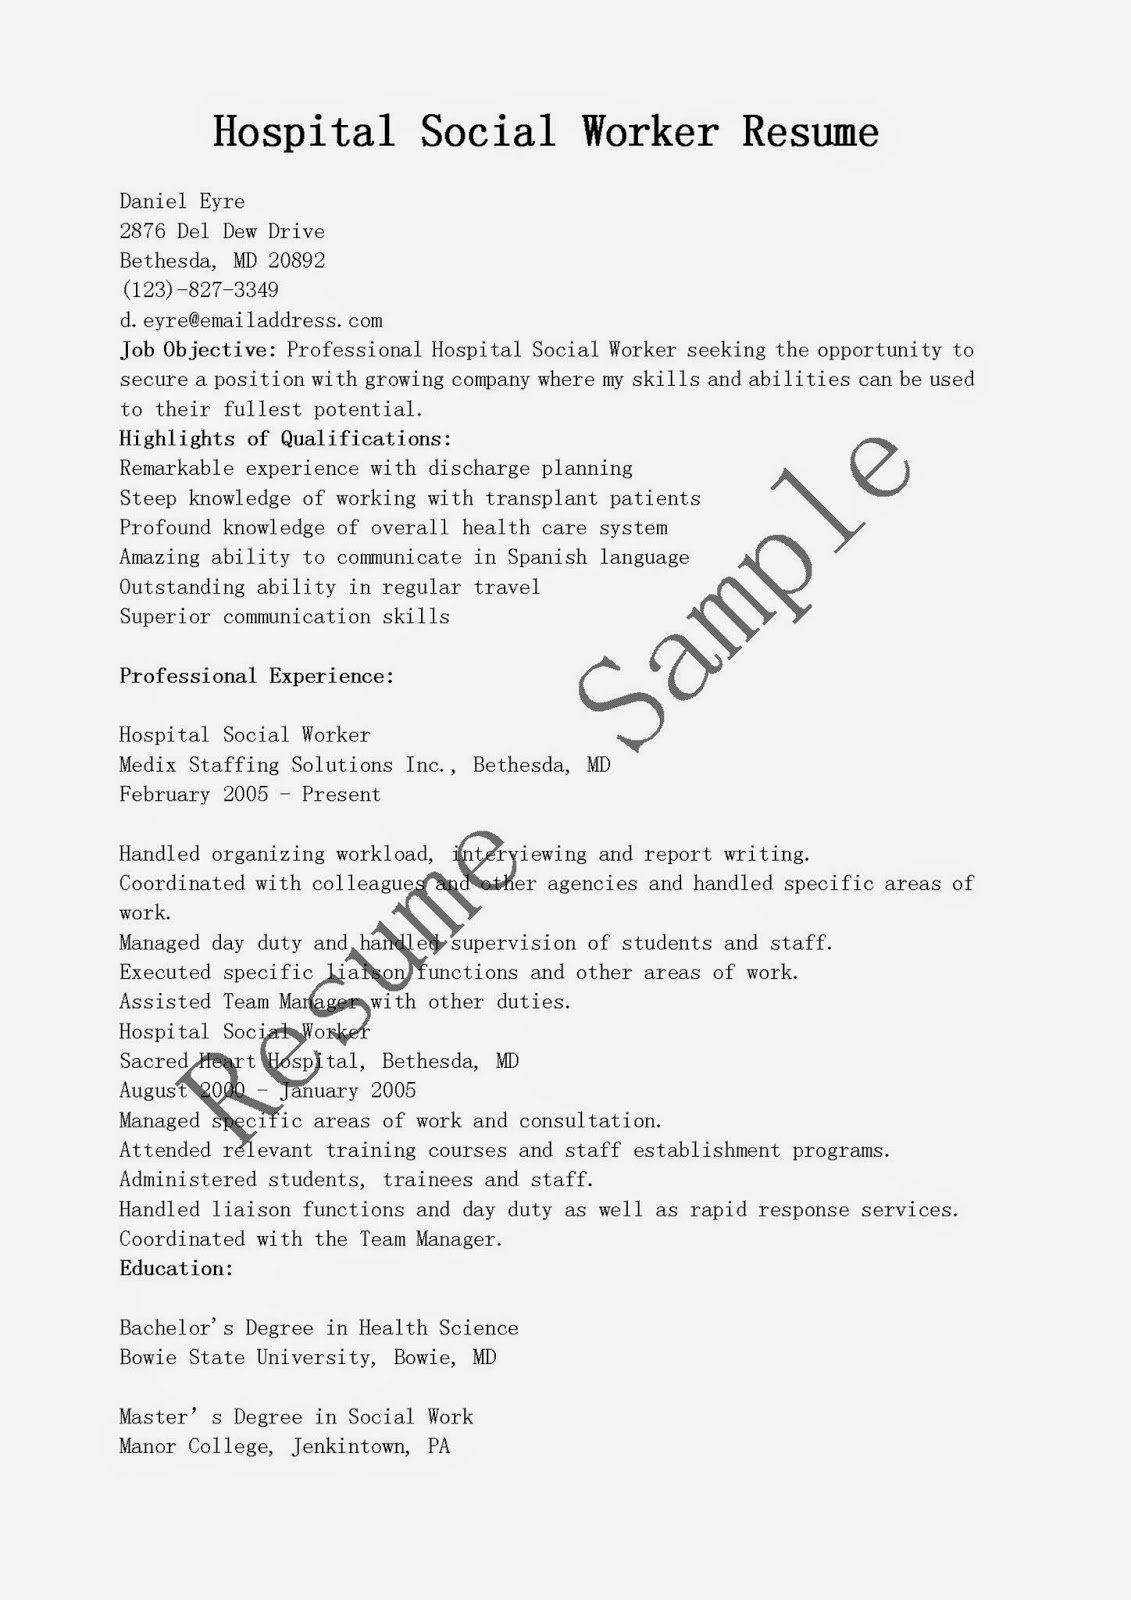 Social Work Resume Template Elegant Resume Samples Hospital social Worker Resume Sample